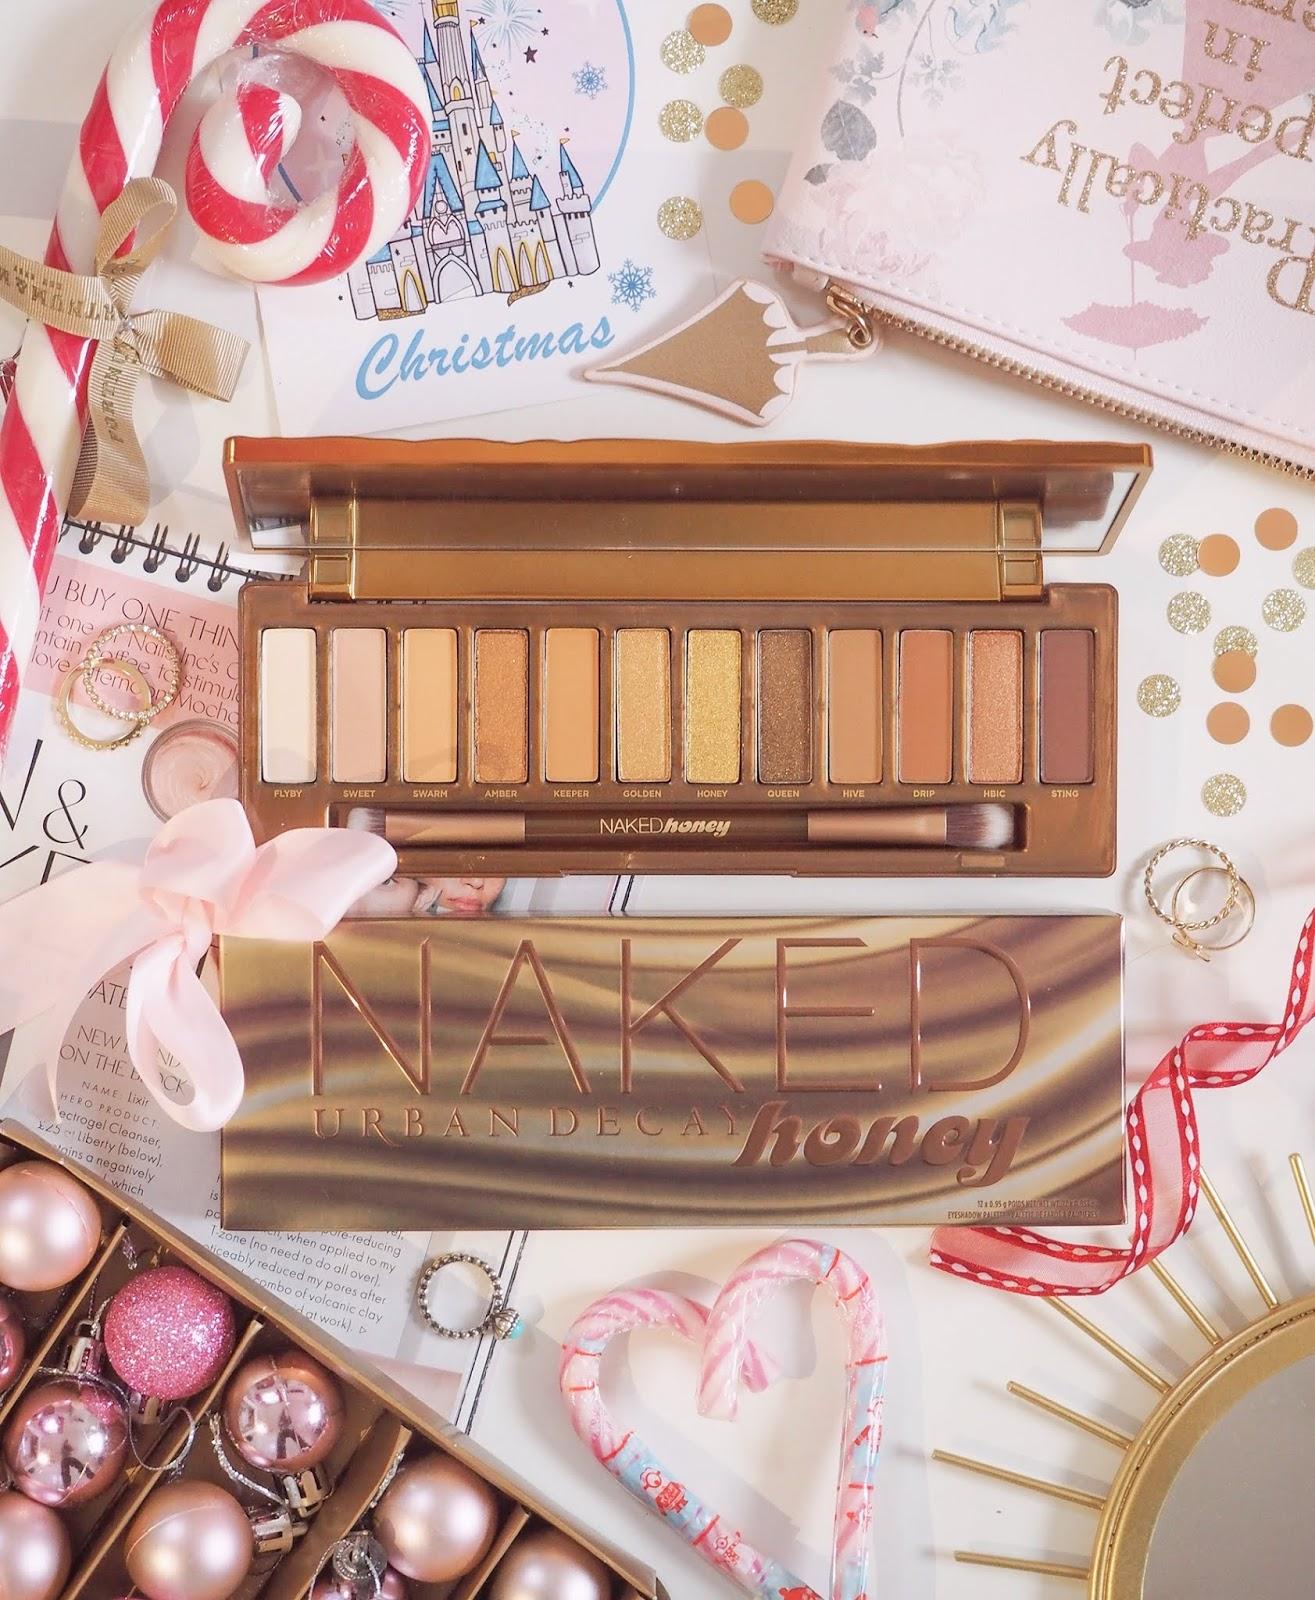 Christmas Gift Guide: Beauty & Skincare